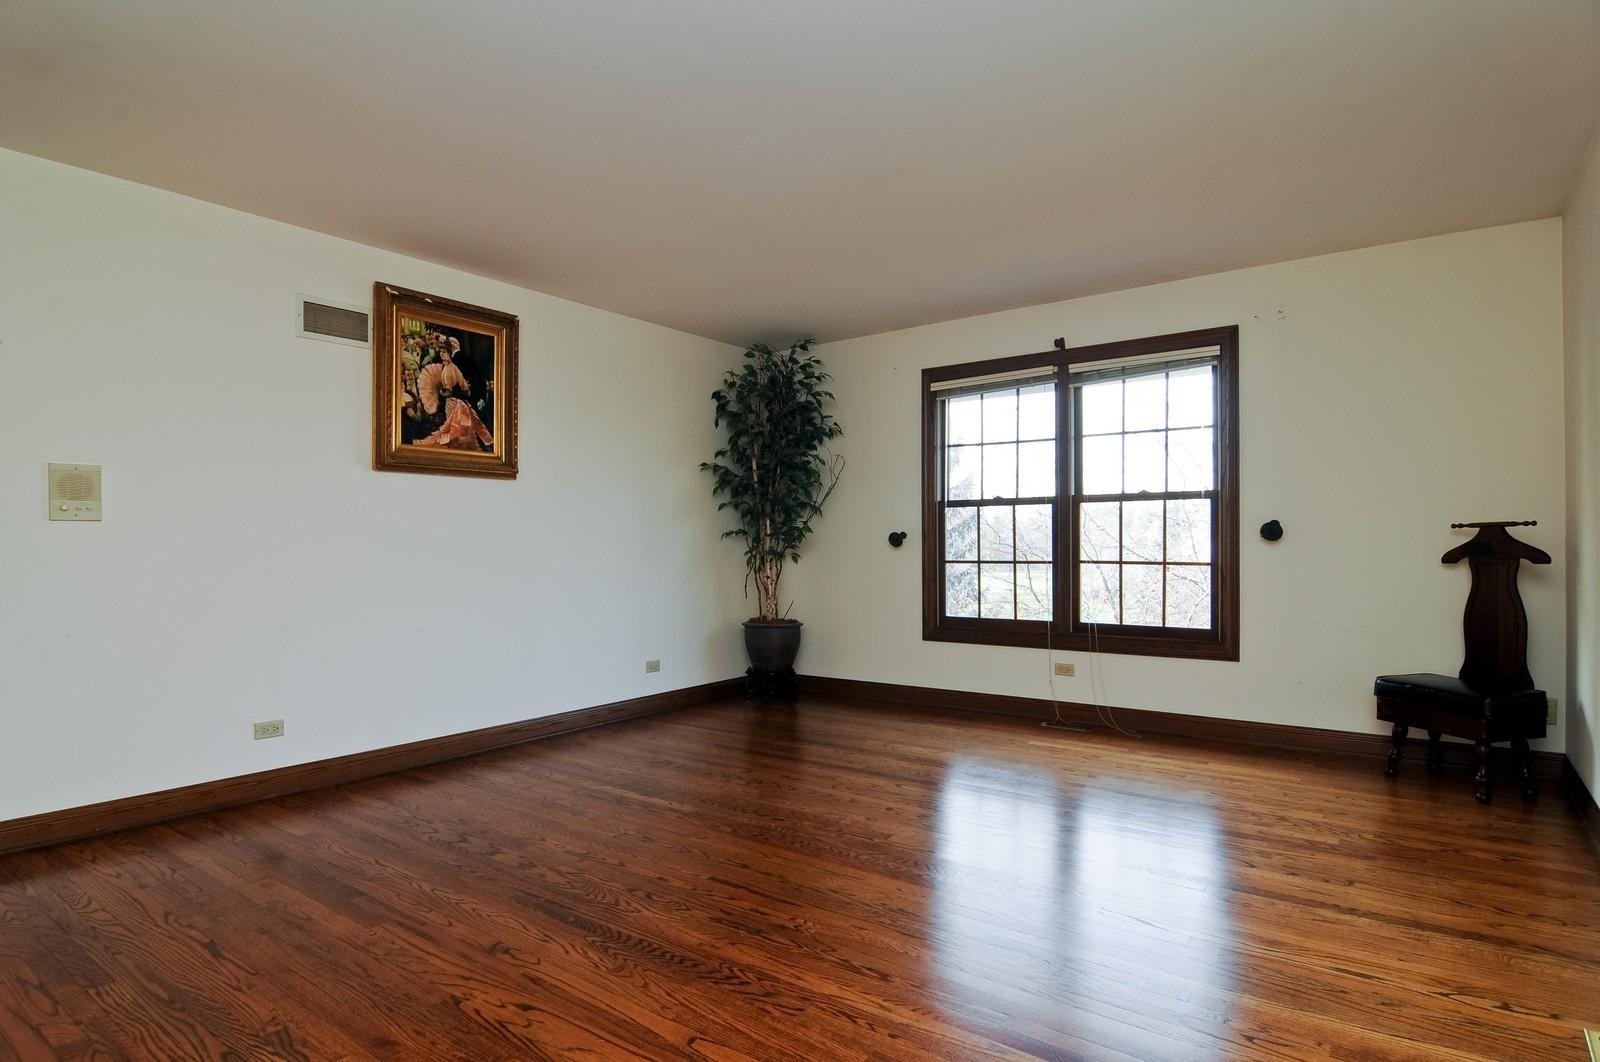 Real Estate Photography - 2091 Trenton, Libertyville, IL, 60048 - Bedroom